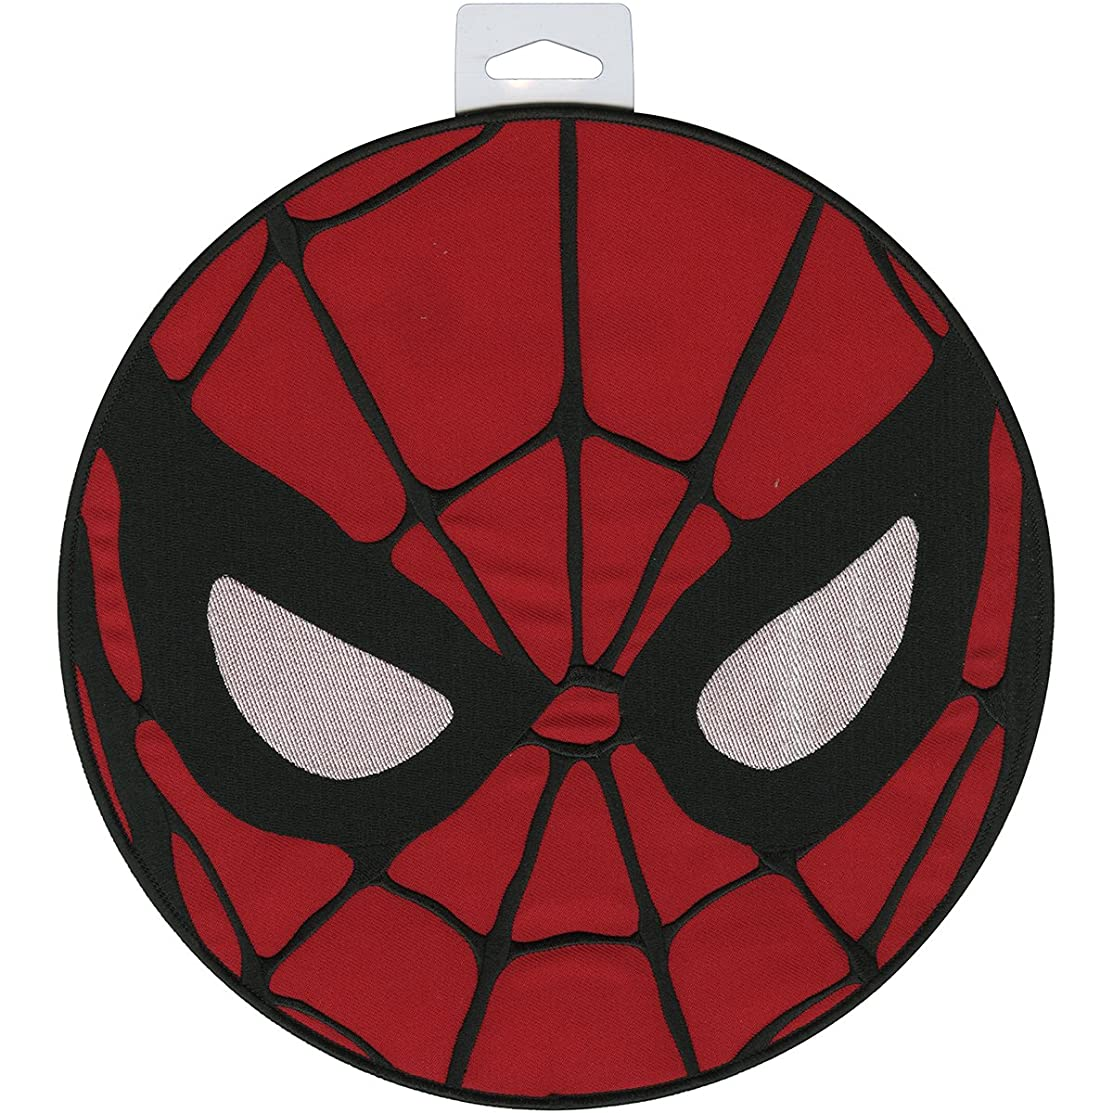 Application Marvel Comics Retro Spiderman Mask Back Patch